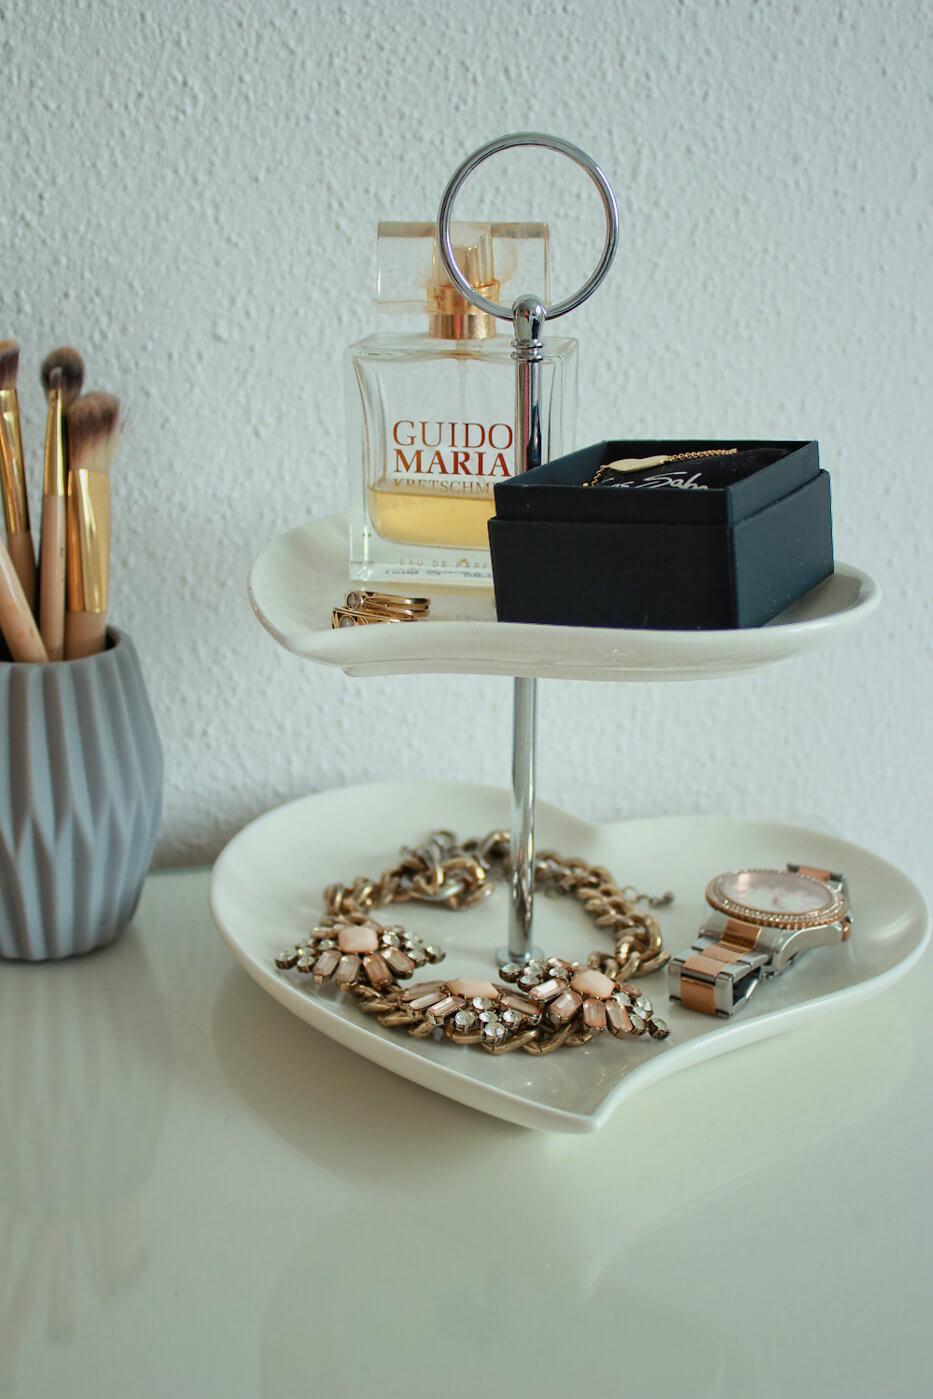 Schmuckaufbewahrung Ketten Ohrringe DIY doityourself blogger tipps accessoires etagere Schminktisch Upcycling Herzetagere weiß gold